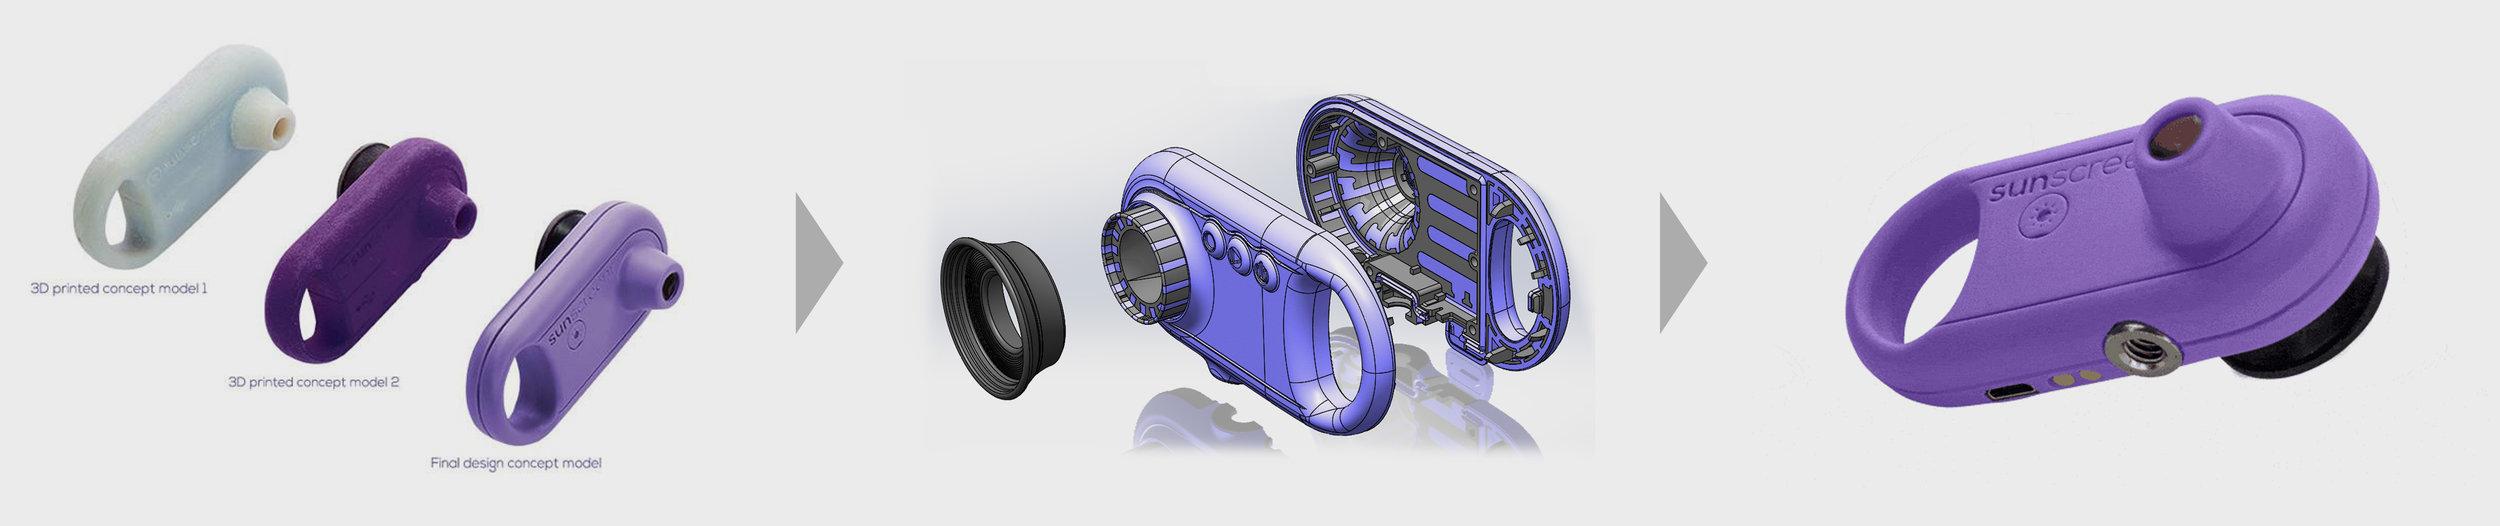 Prototype and concept development long image.jpg